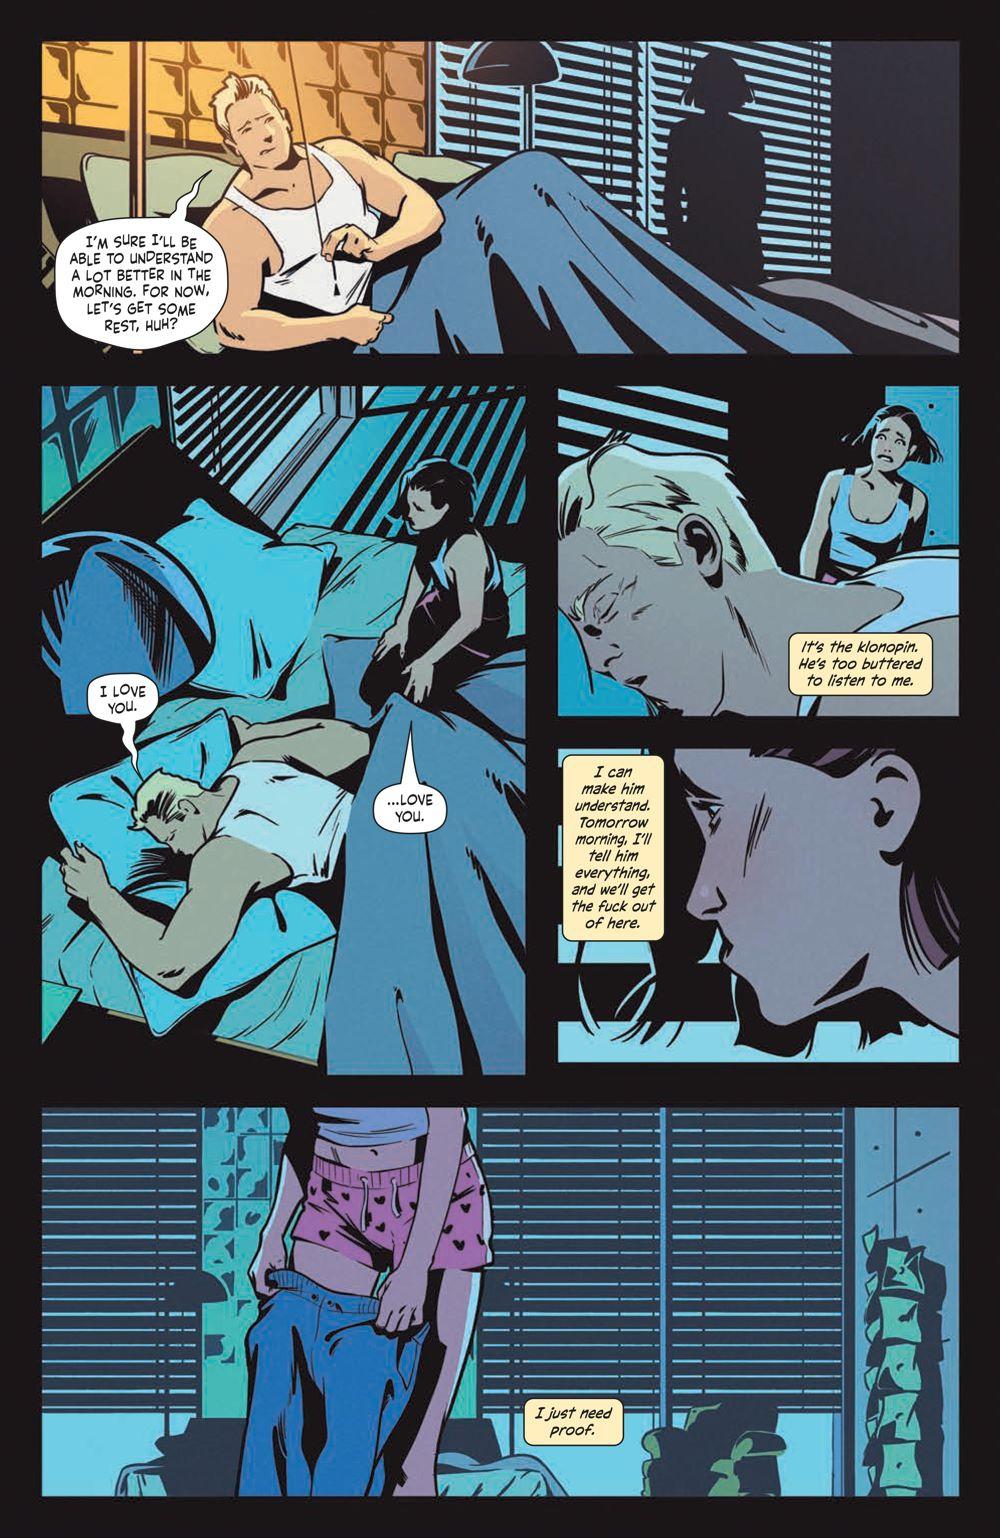 EatRich_002_PRESS_8 ComicList Previews: EAT THE RICH #2 (OF 5)